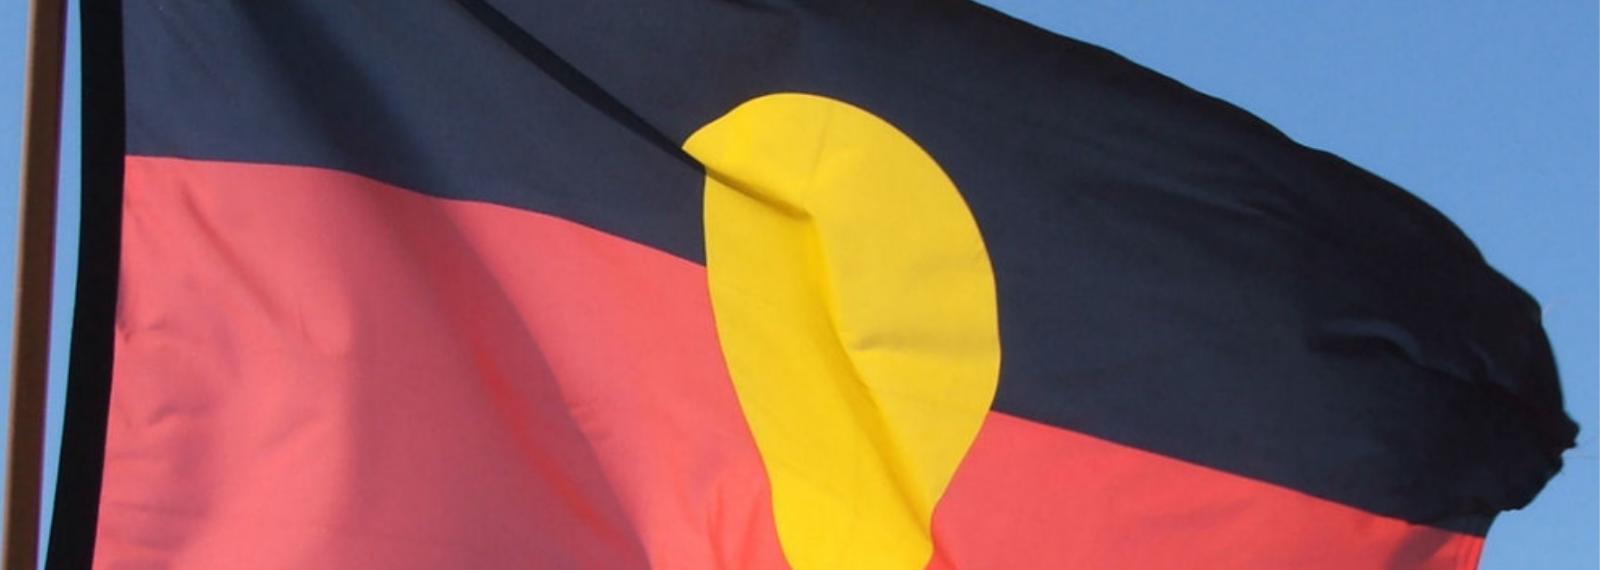 Photo of an Aboriginal flag